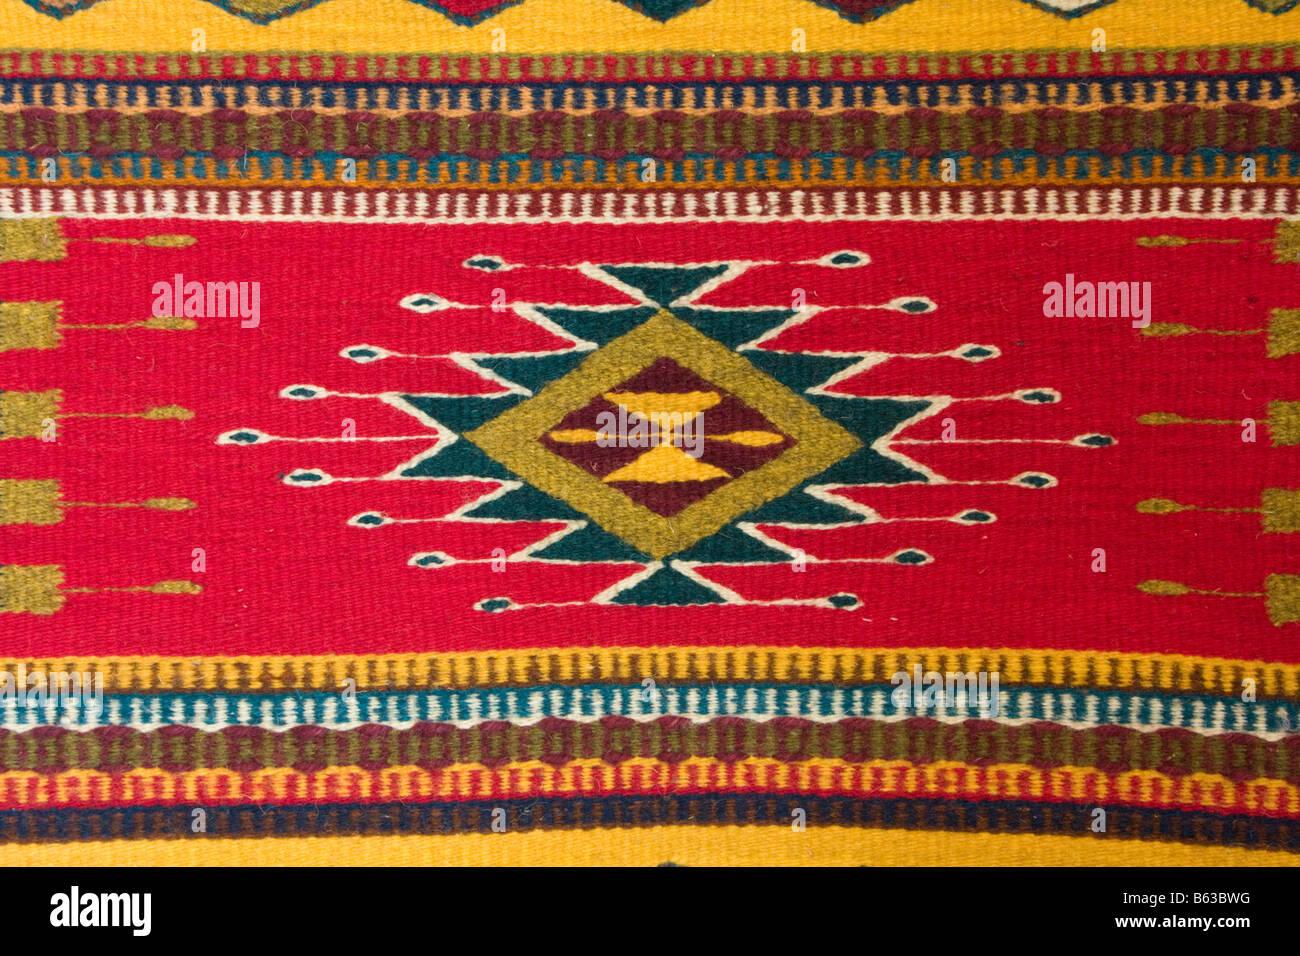 Santa Ana del Valle Oaxaca Mexico Textile showing